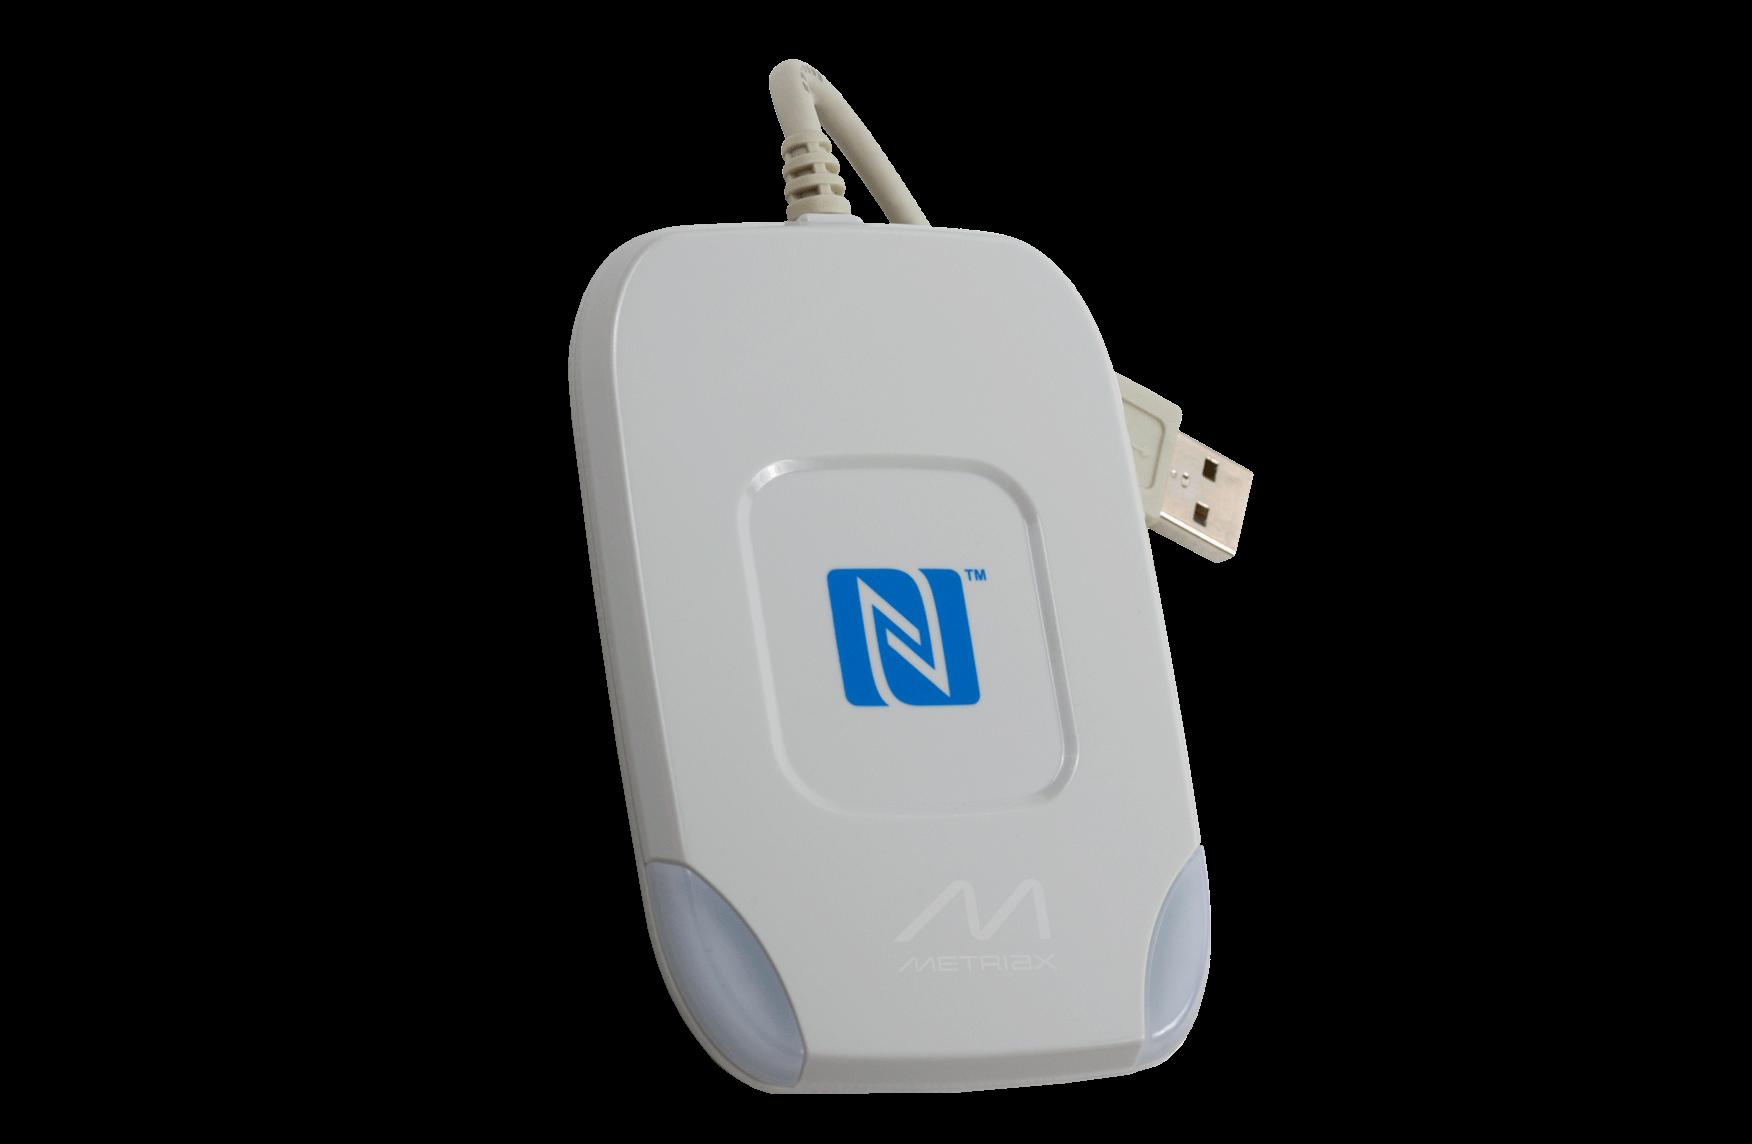 MDE Dragon USB-RFID Tischleser-Metriax GmbH-RFID NFC-Lesegerät